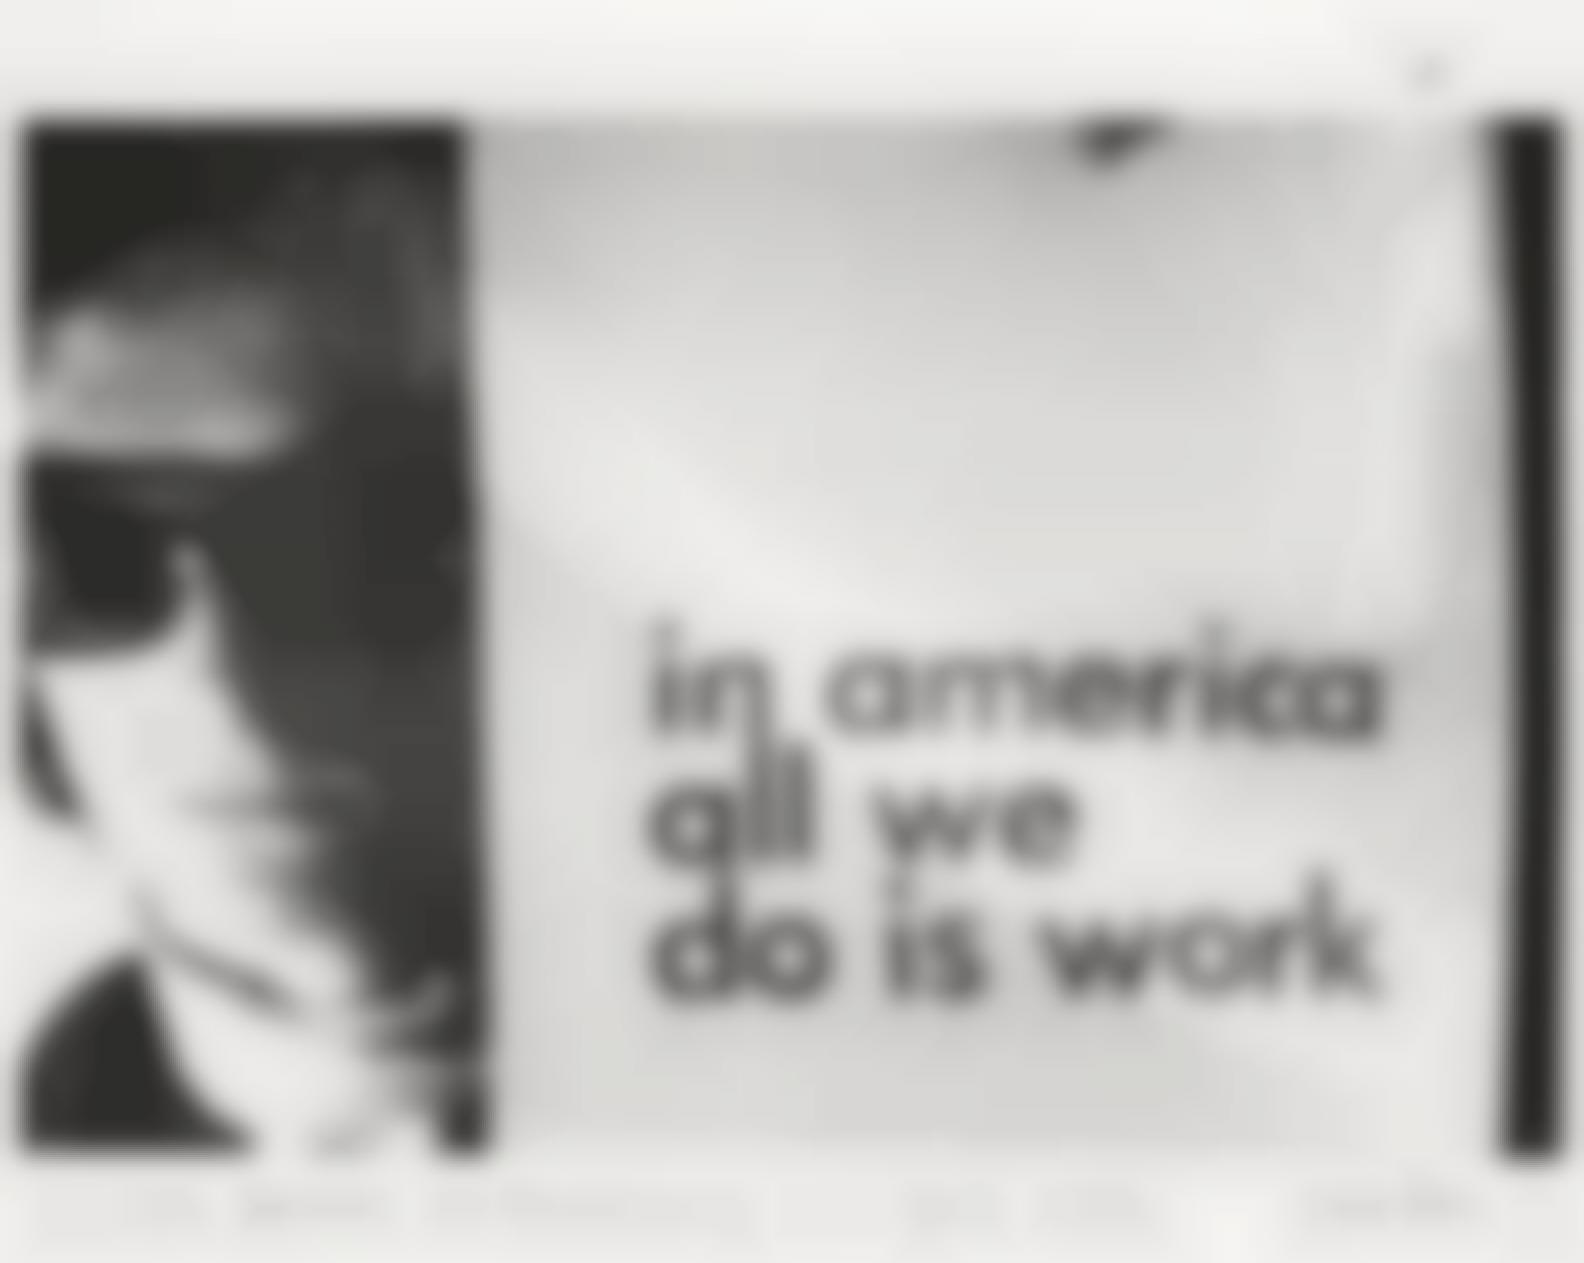 Victor Bockris - Victor Bockris On Television, New York-1972